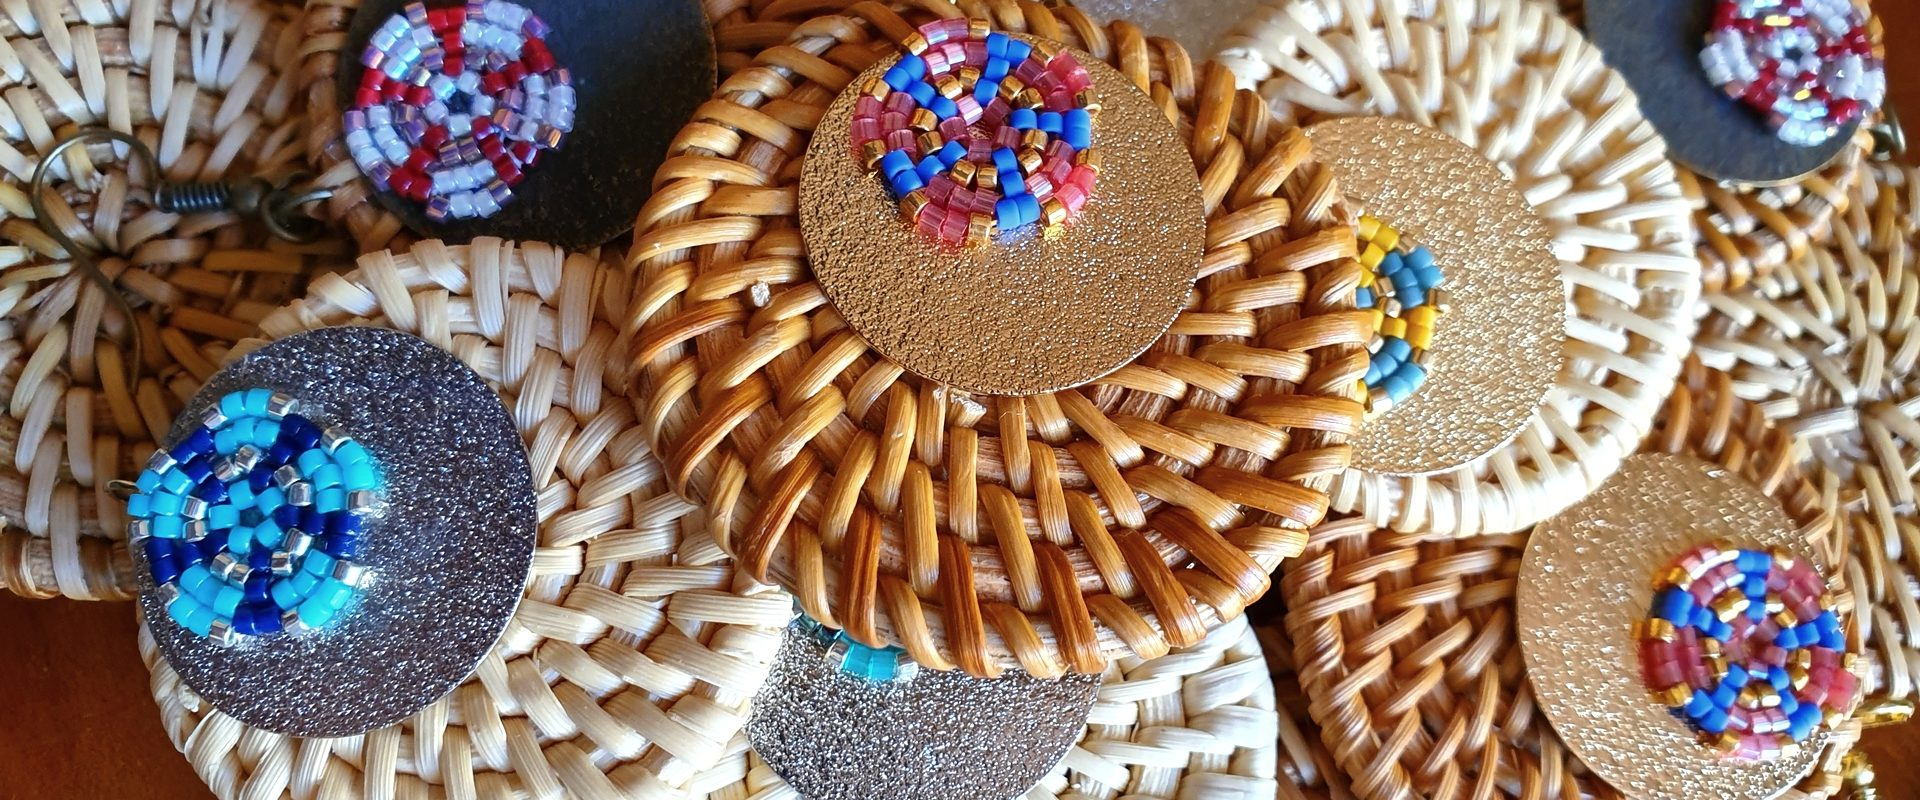 Gebetnout bijoux fantaisie lyon mode tendance bijouterie femme Oullins artisan rotin miyuki perle vietnam